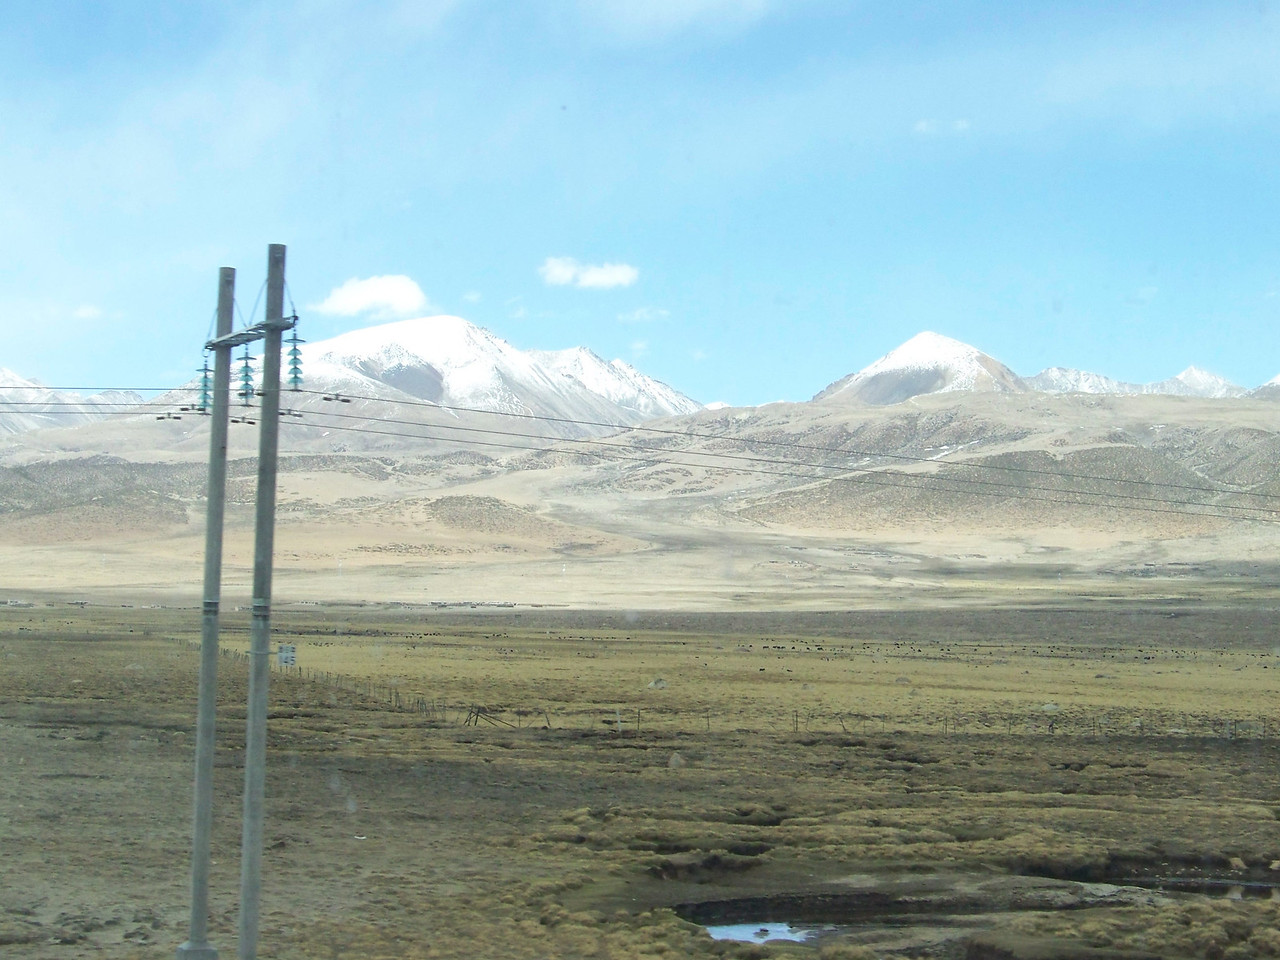 0117 - Scenery on Train Trip Between Beijing and Lhasa.JPG